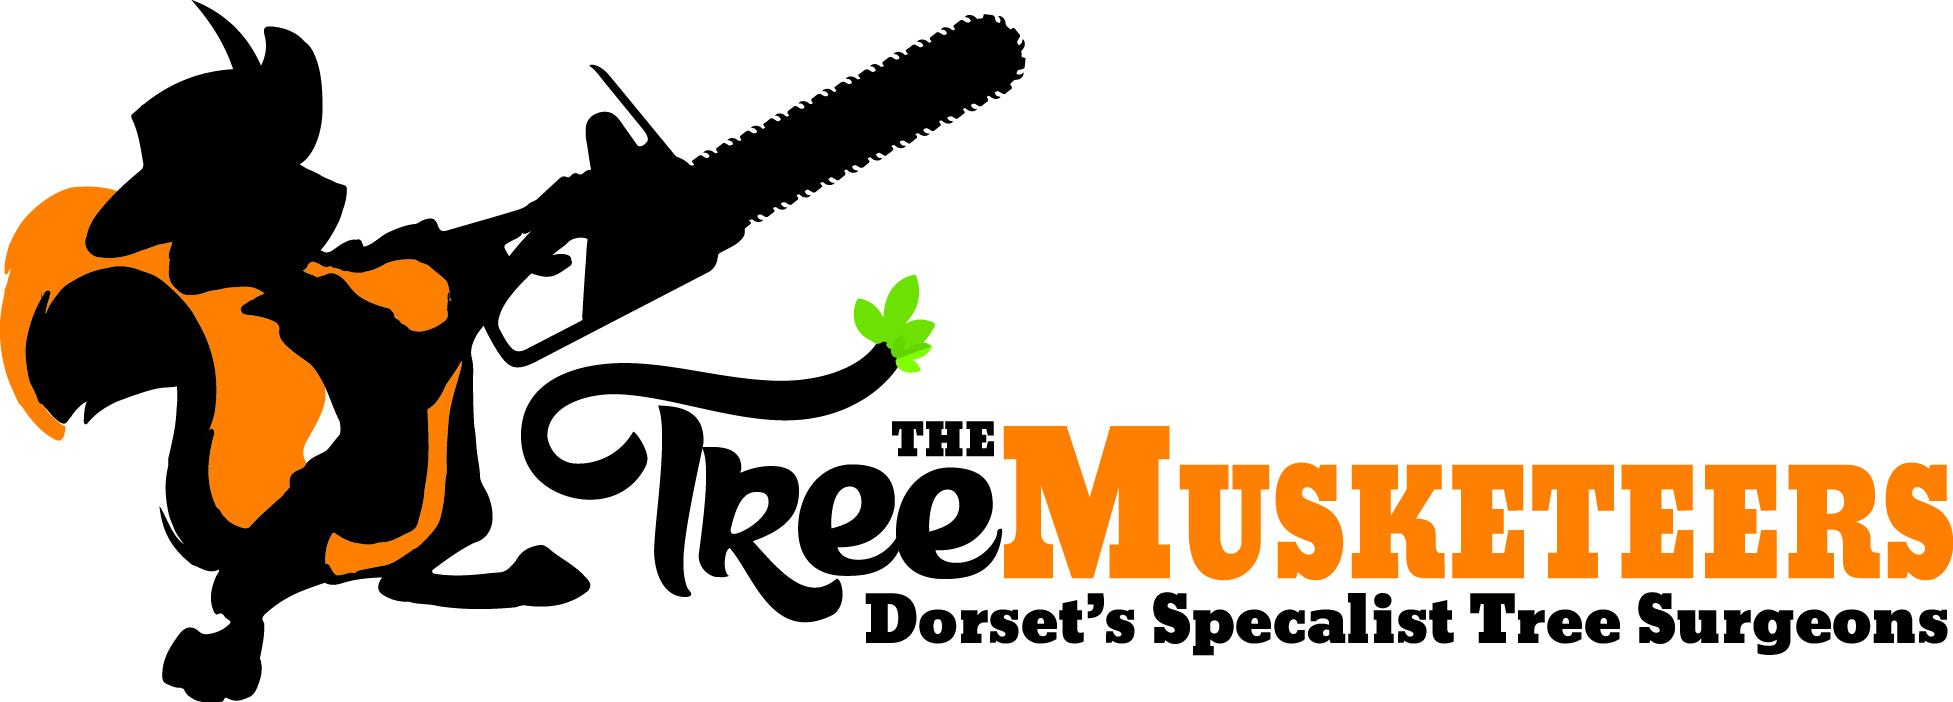 Bournemouth Tree Surgeons The Tree Musketeers